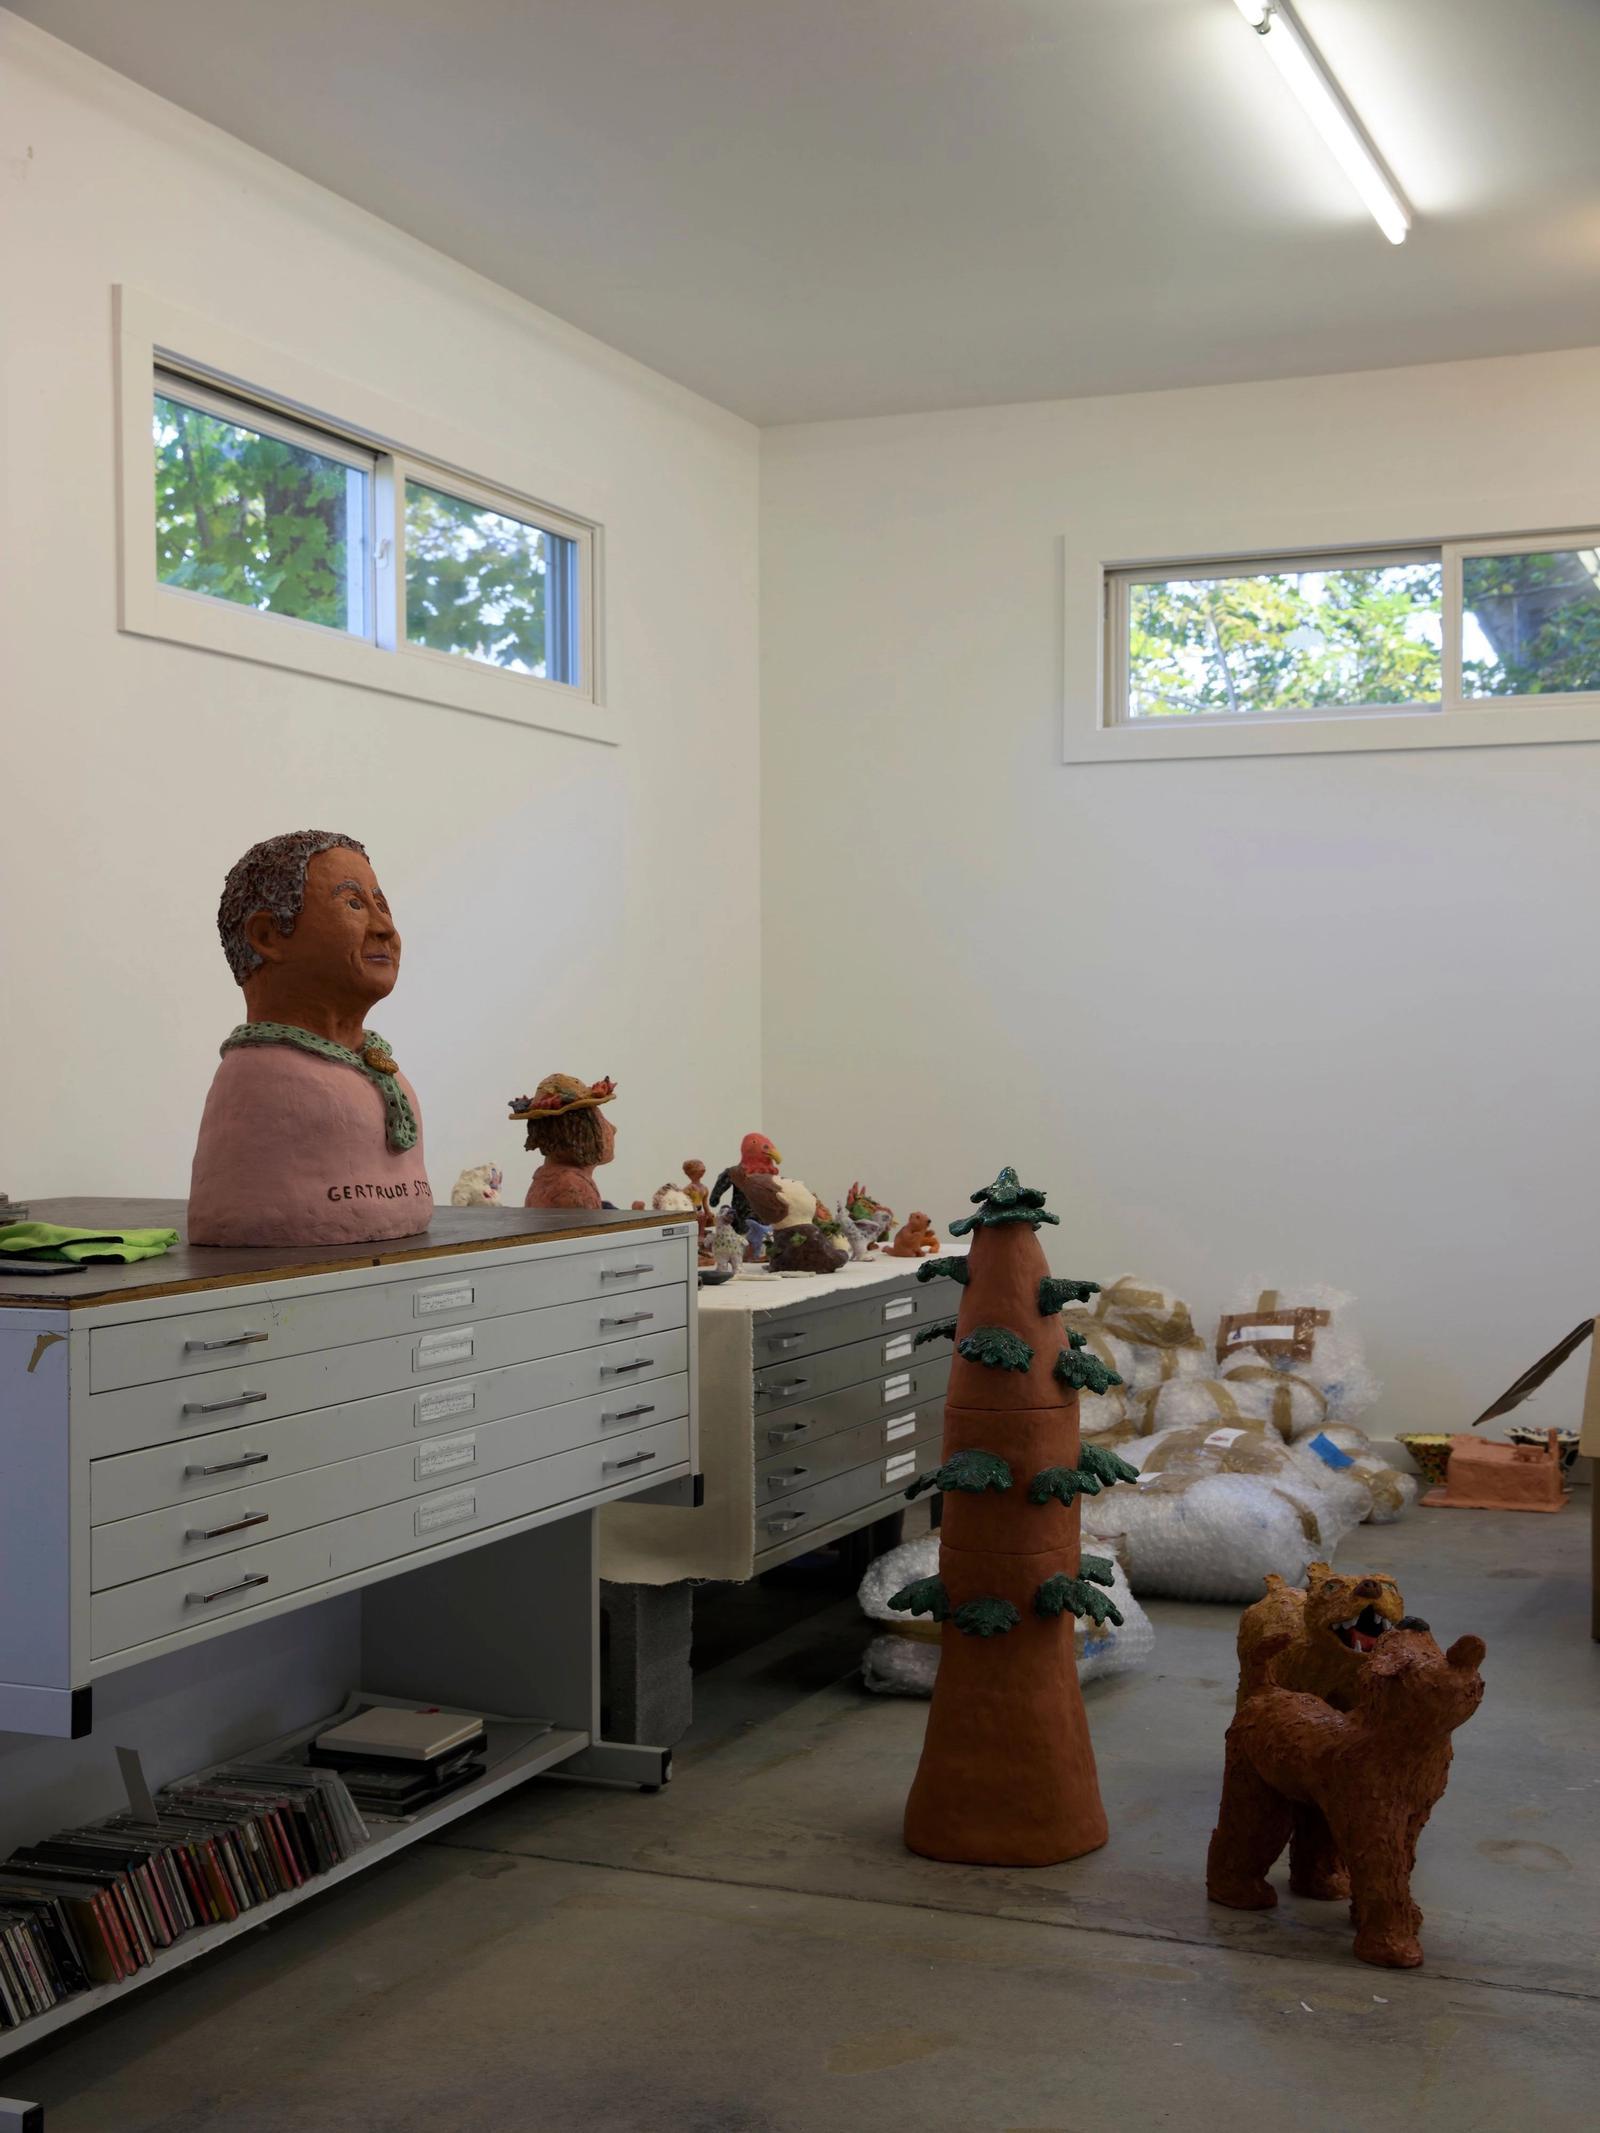 Sally Saul's artist studio